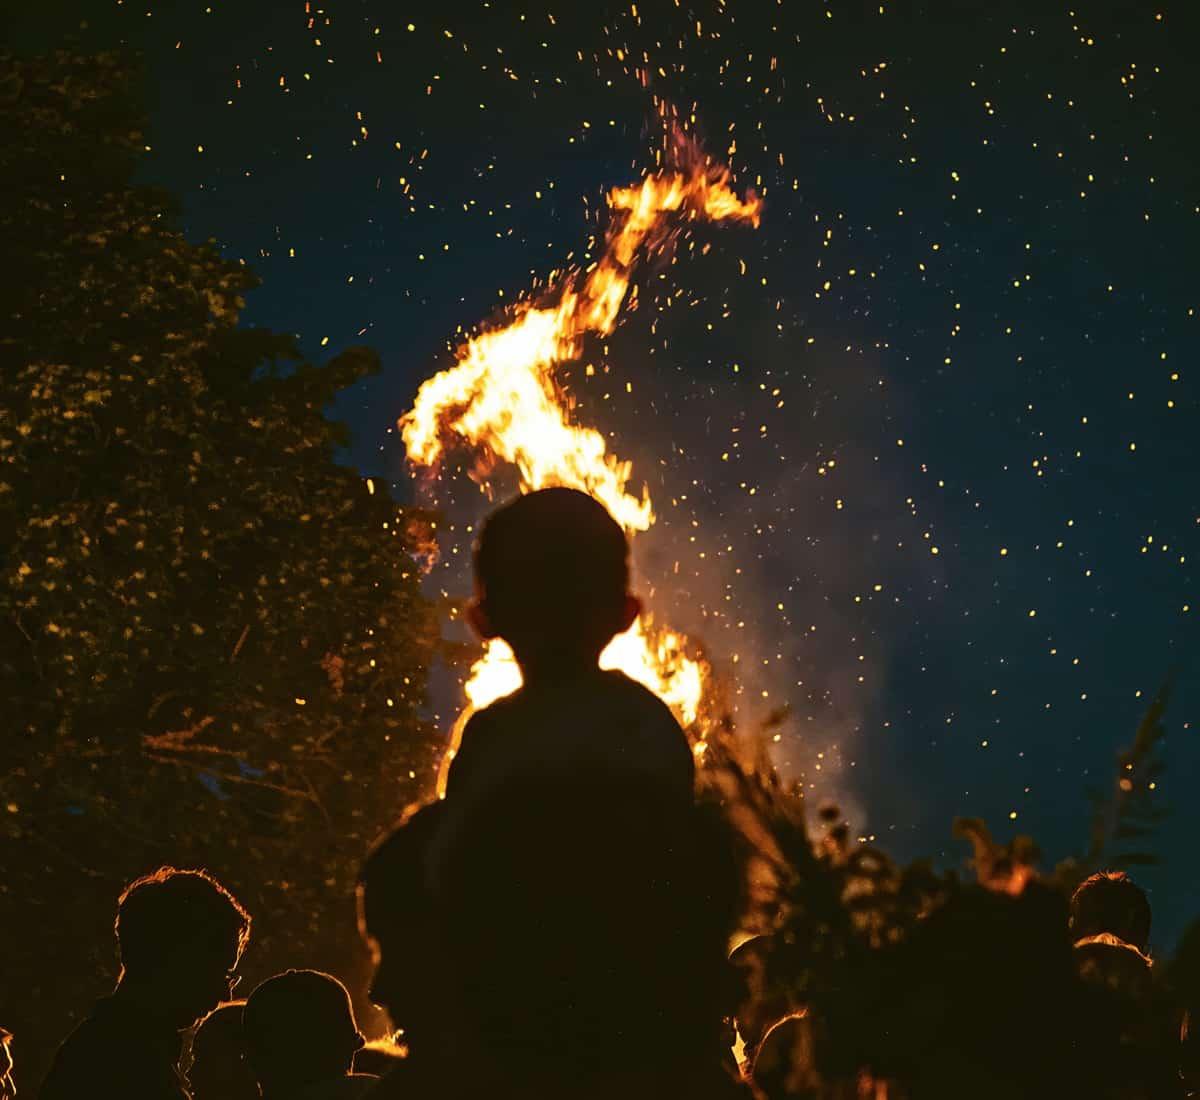 Bonfire & Fireworks